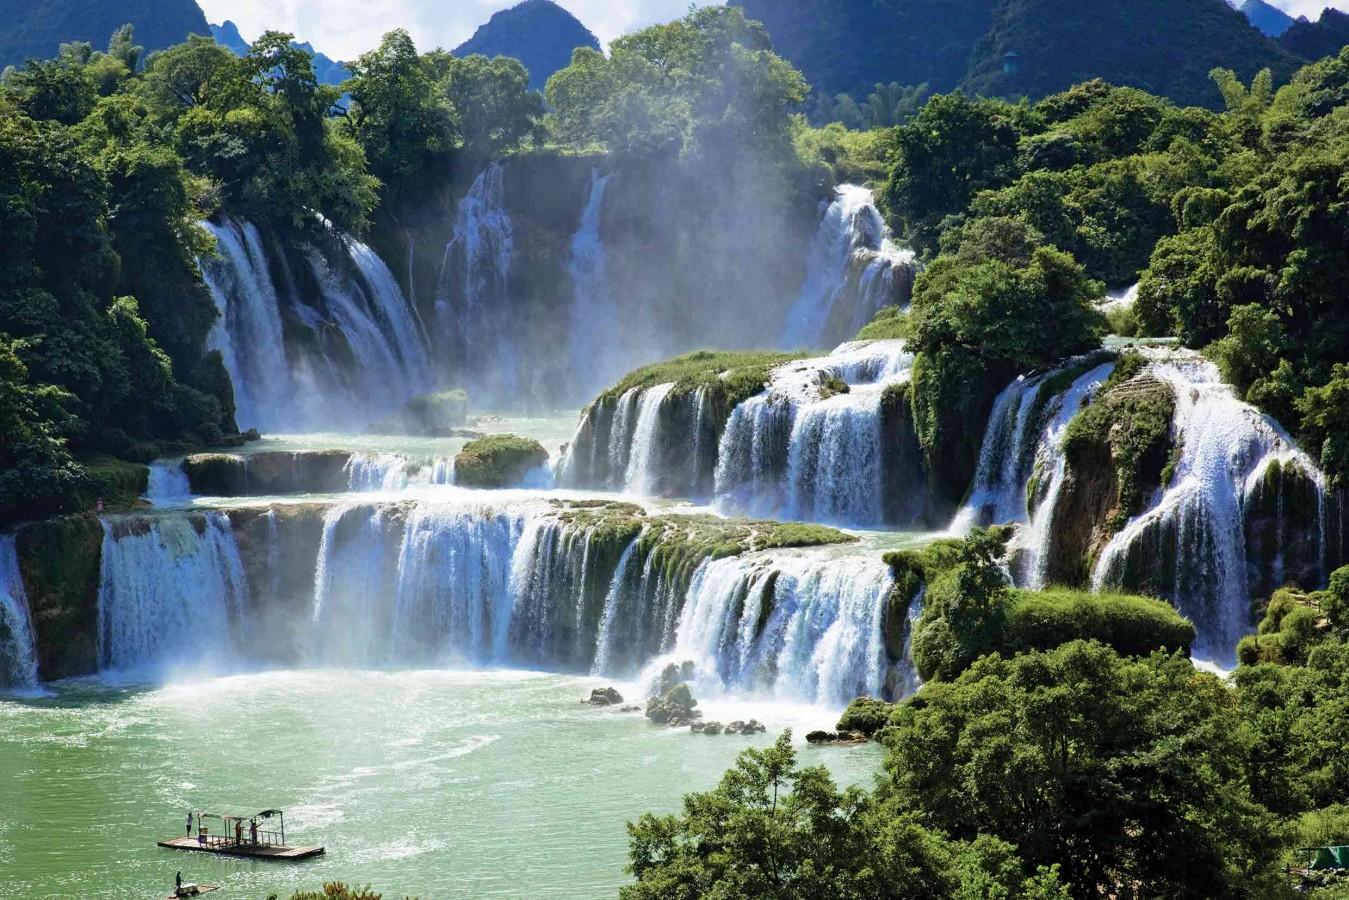 Fotomural Ban Gioc Waterfall A08-M873 Fotomural Ban Gioc Waterfall A08-M873